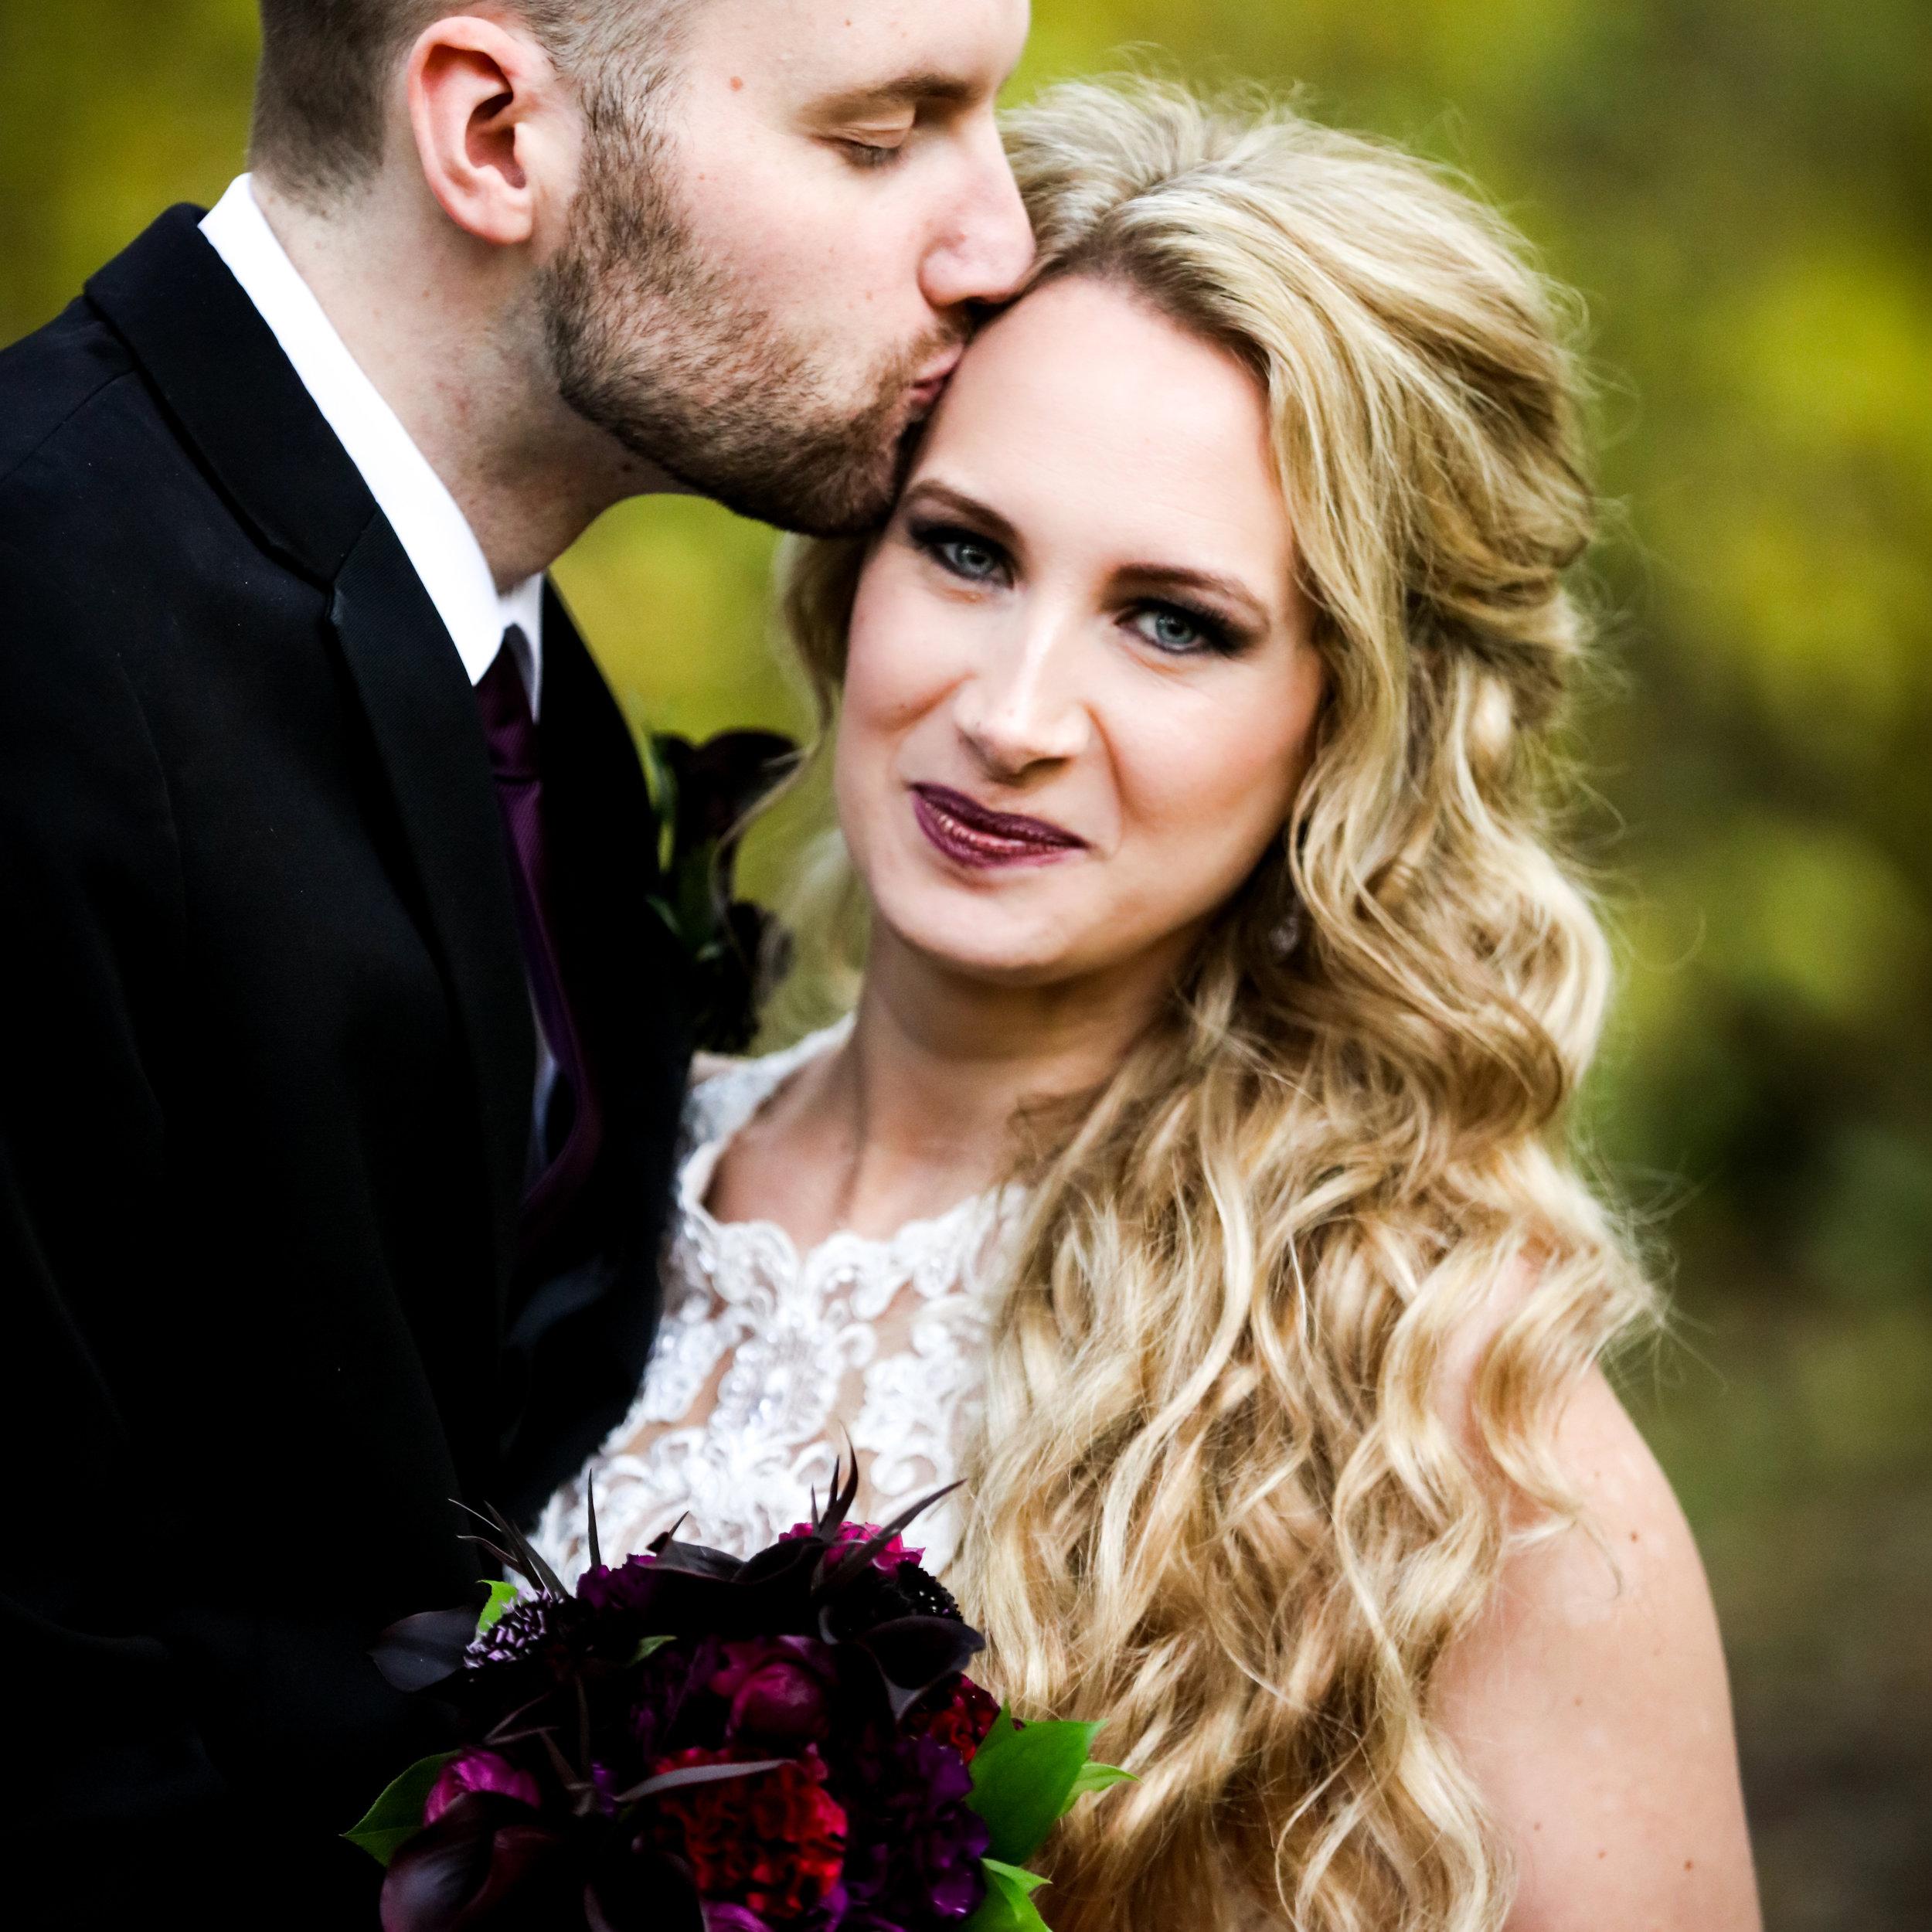 WeddingWebsite-93.jpg